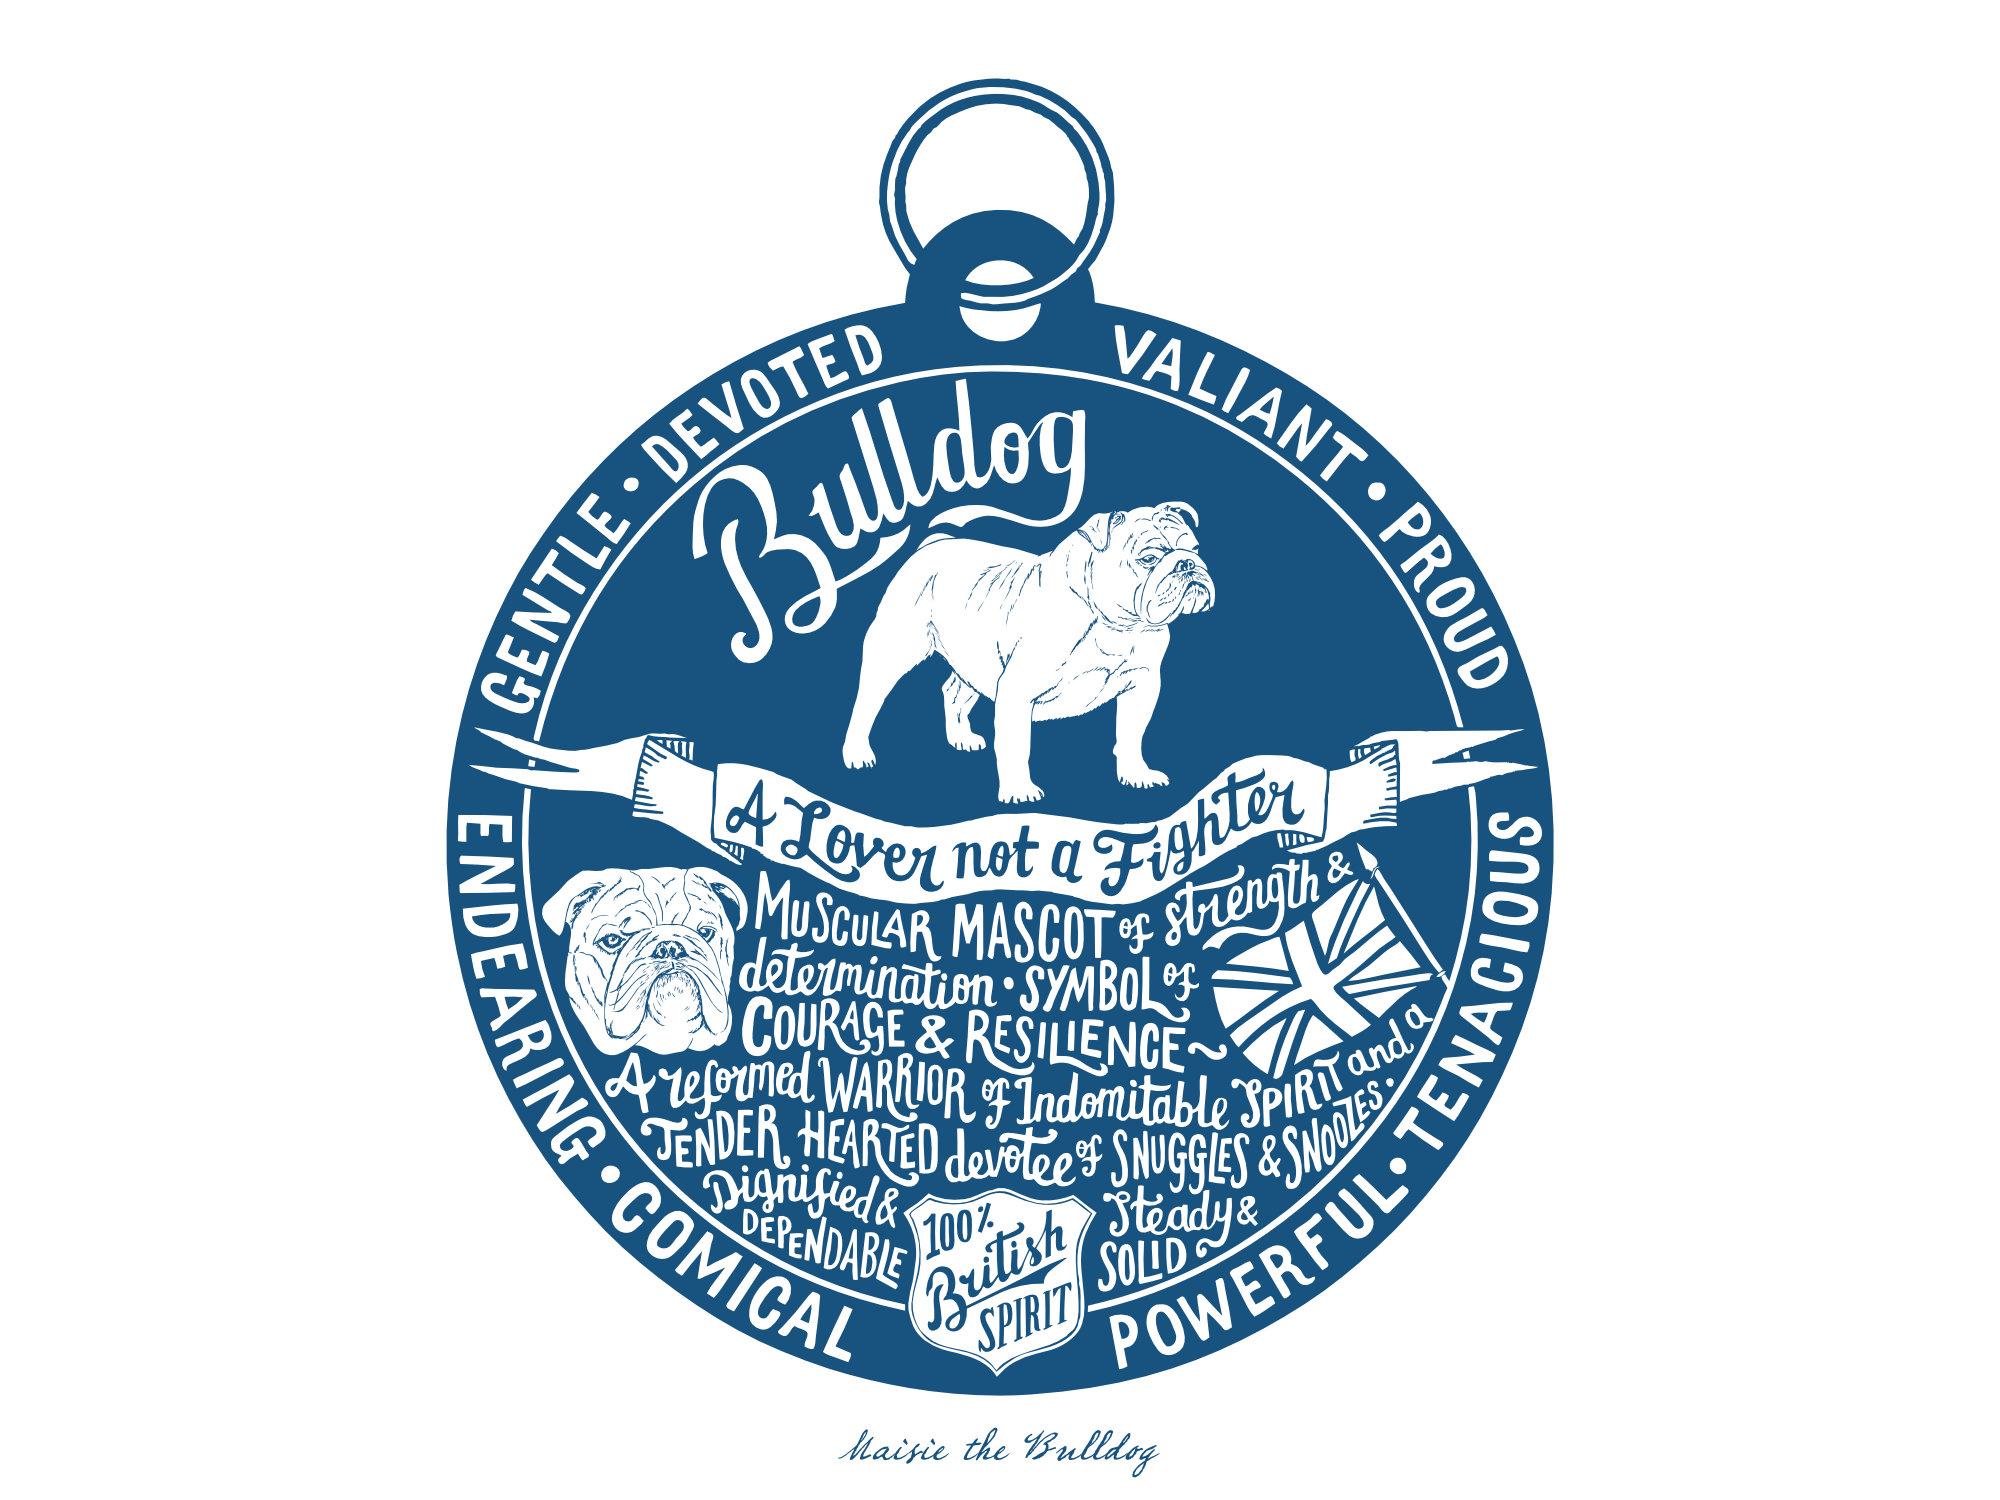 English Bulldog Print Unframed | The Enlightened Hound